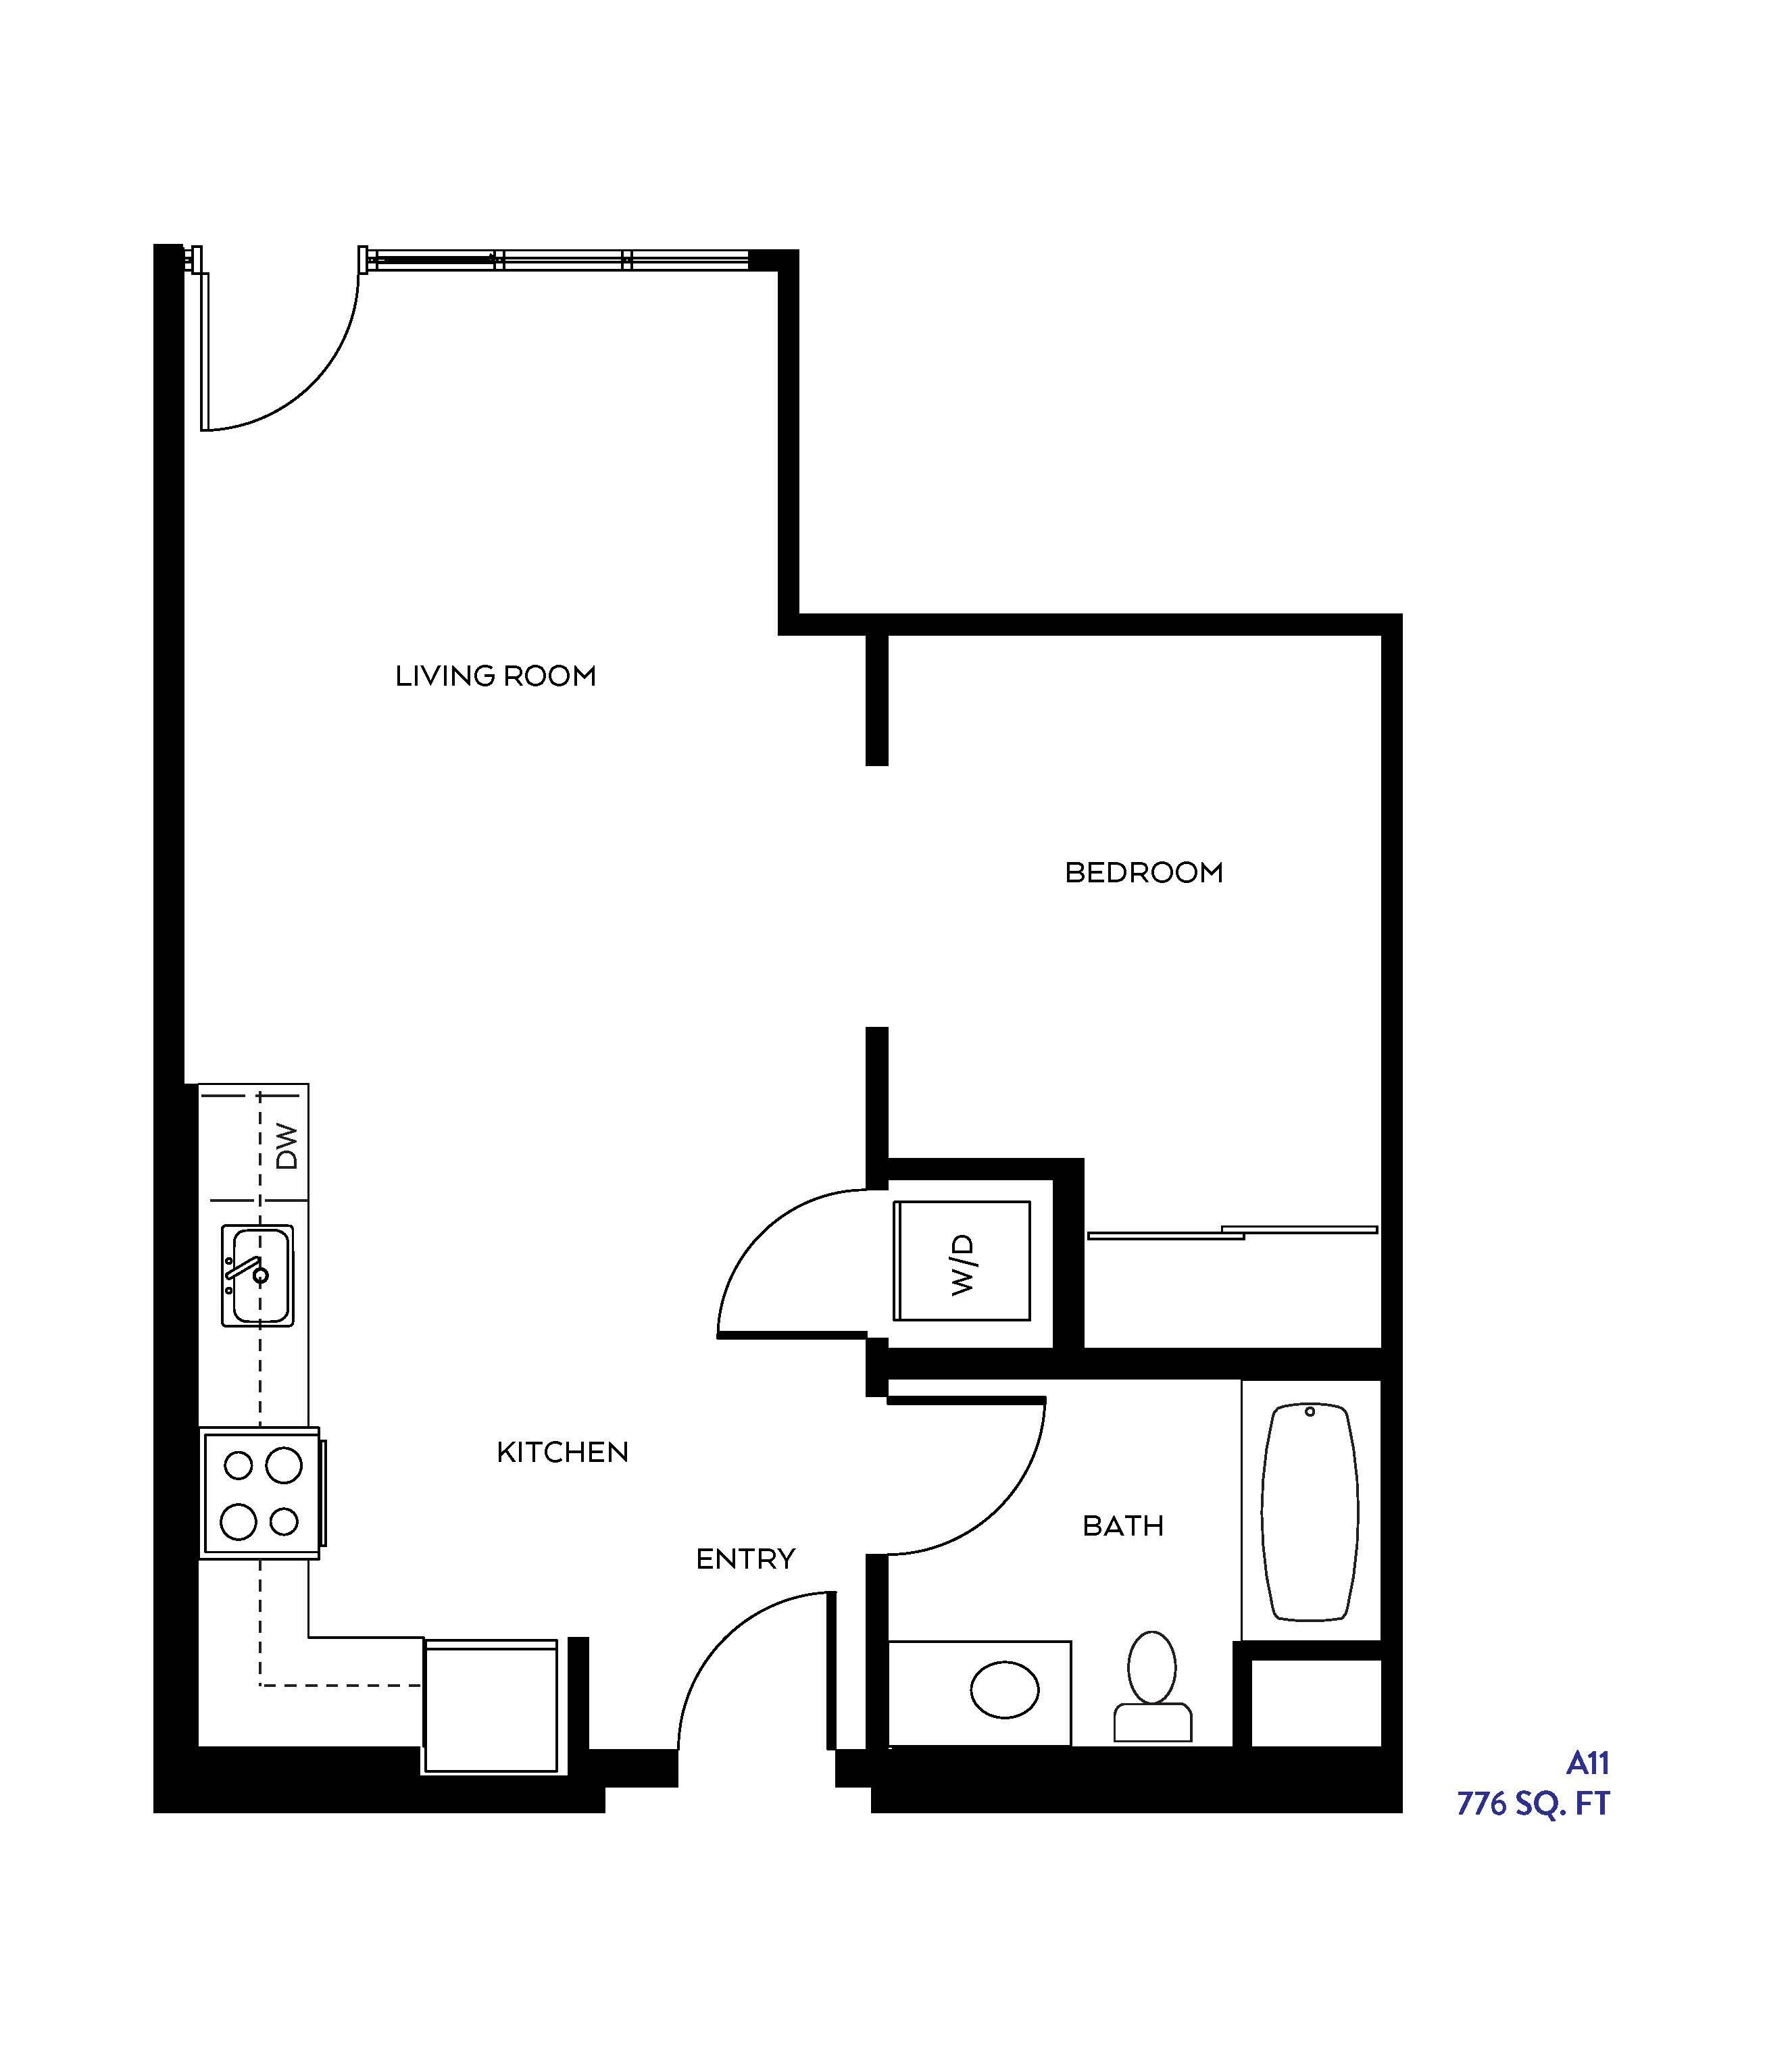 The A11 floor plan